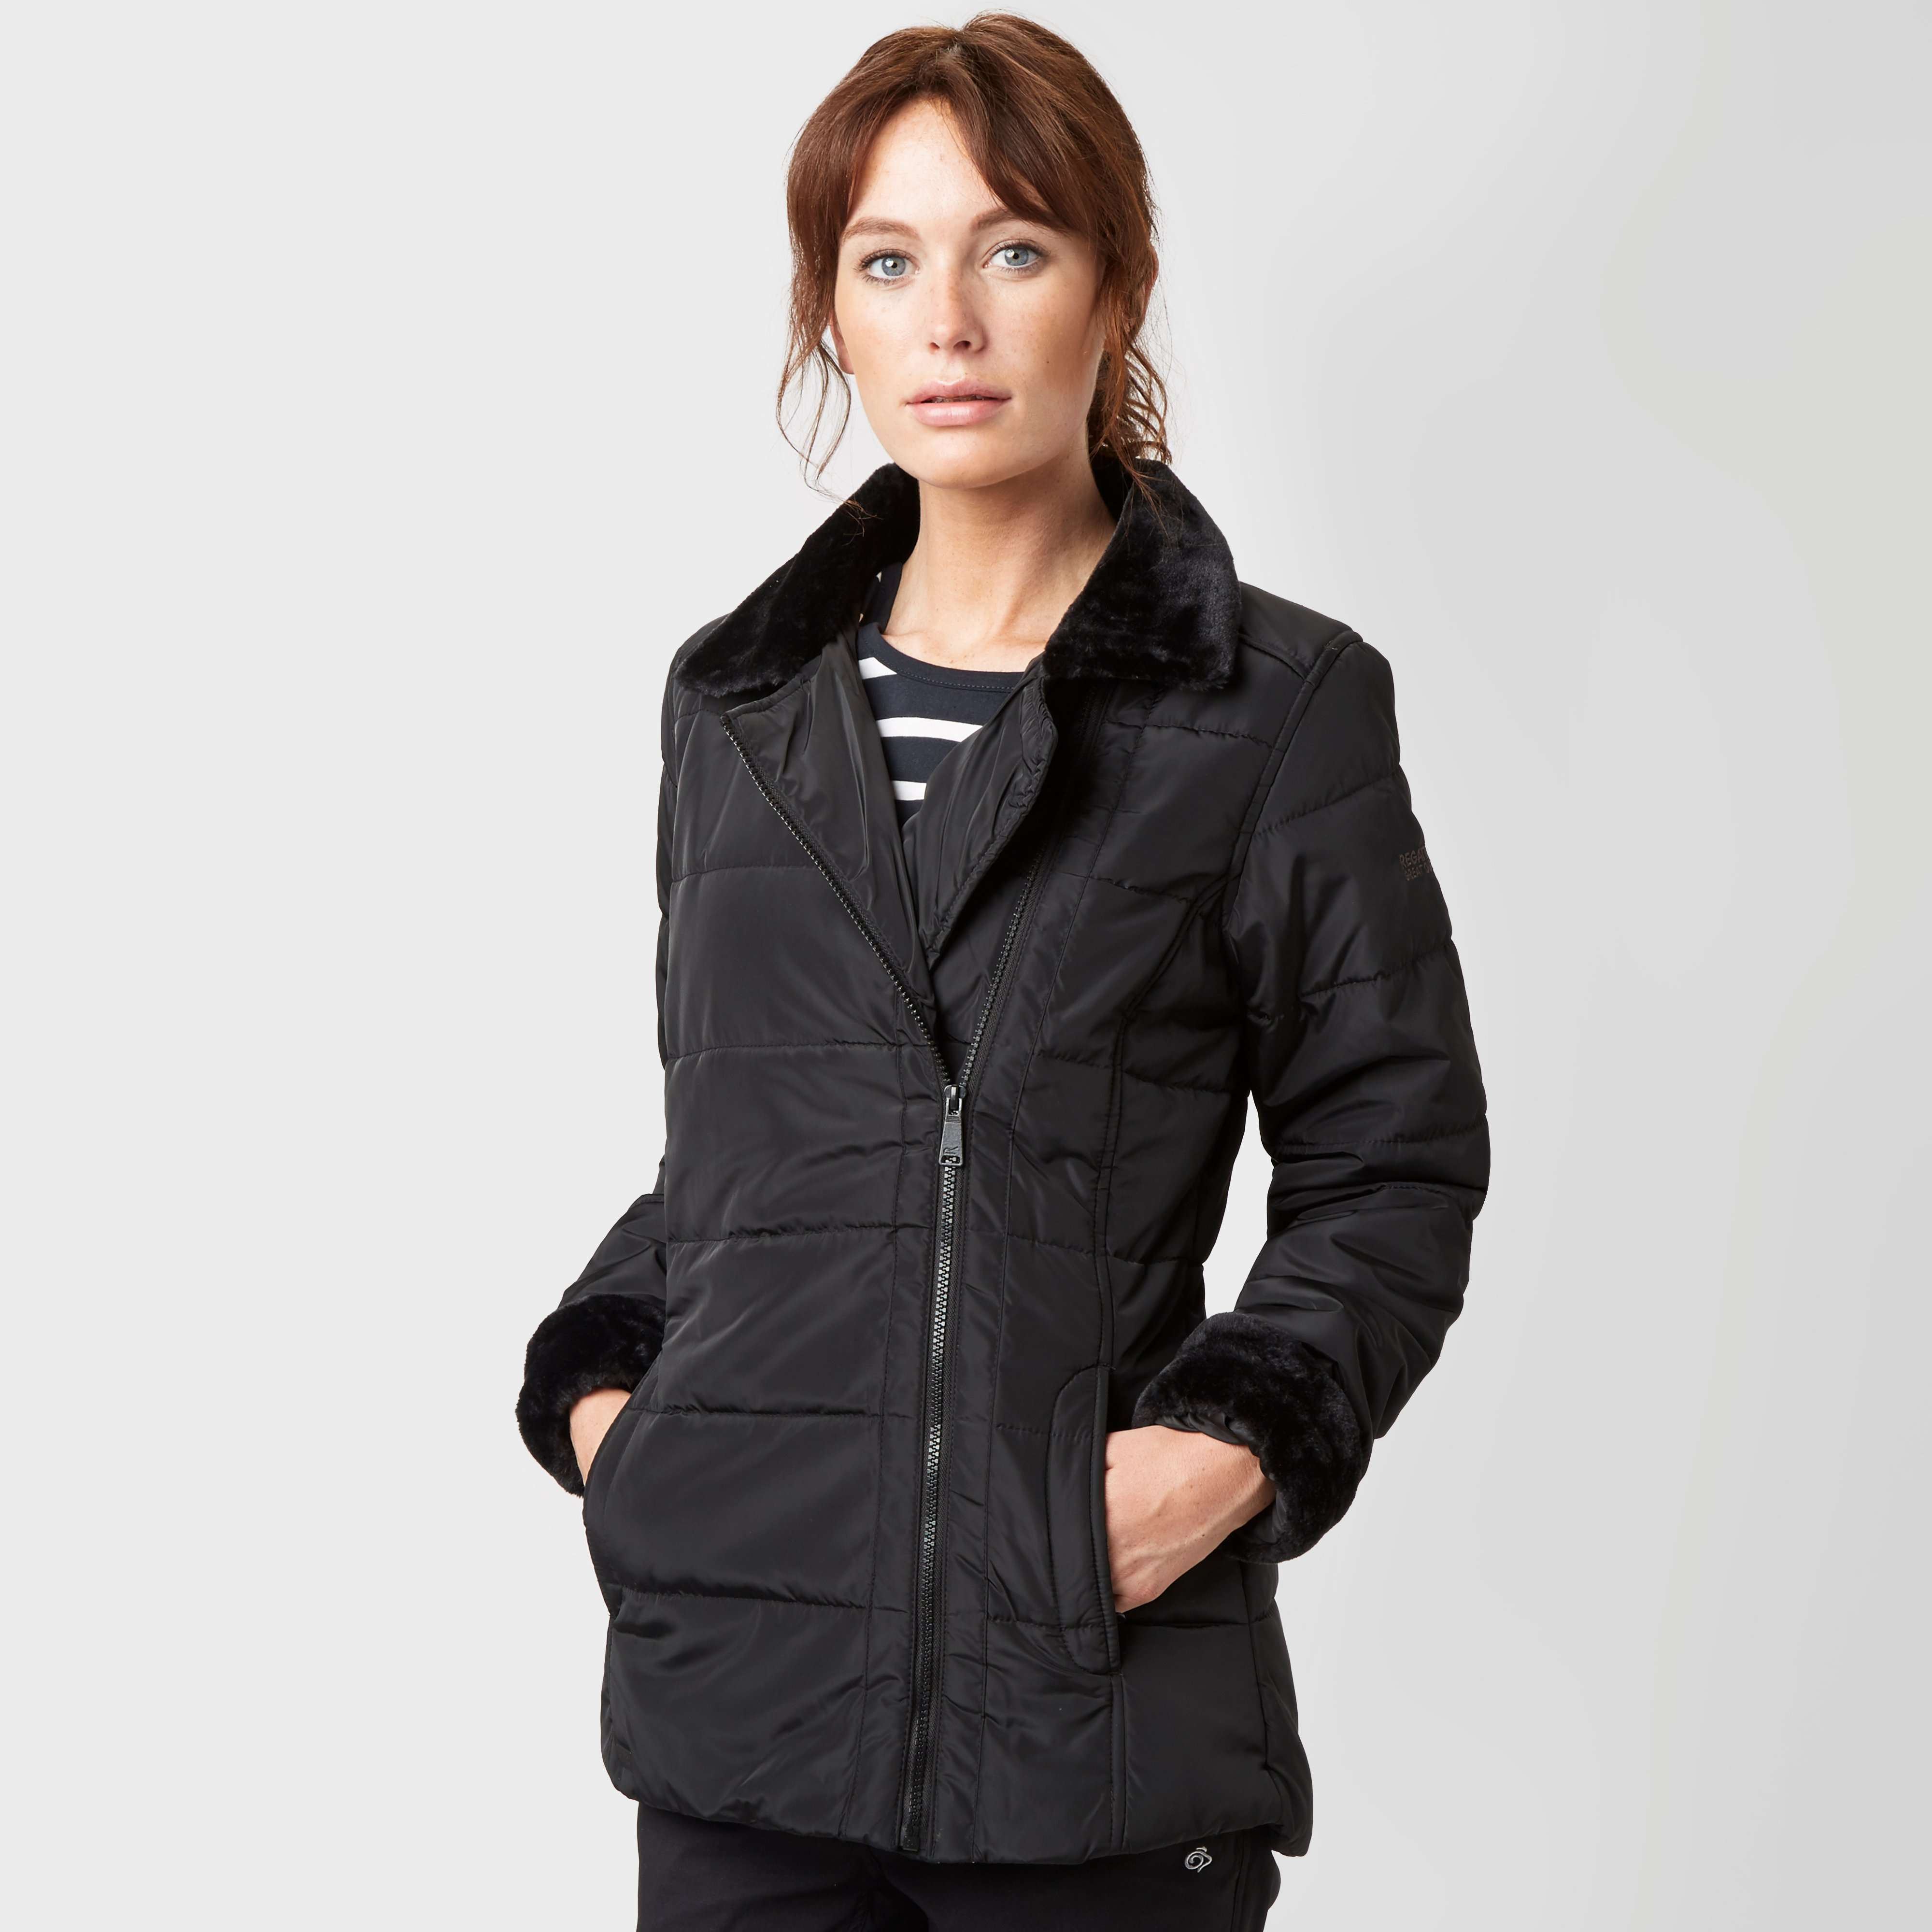 REGATTA Women's Wren Insulated Jacket